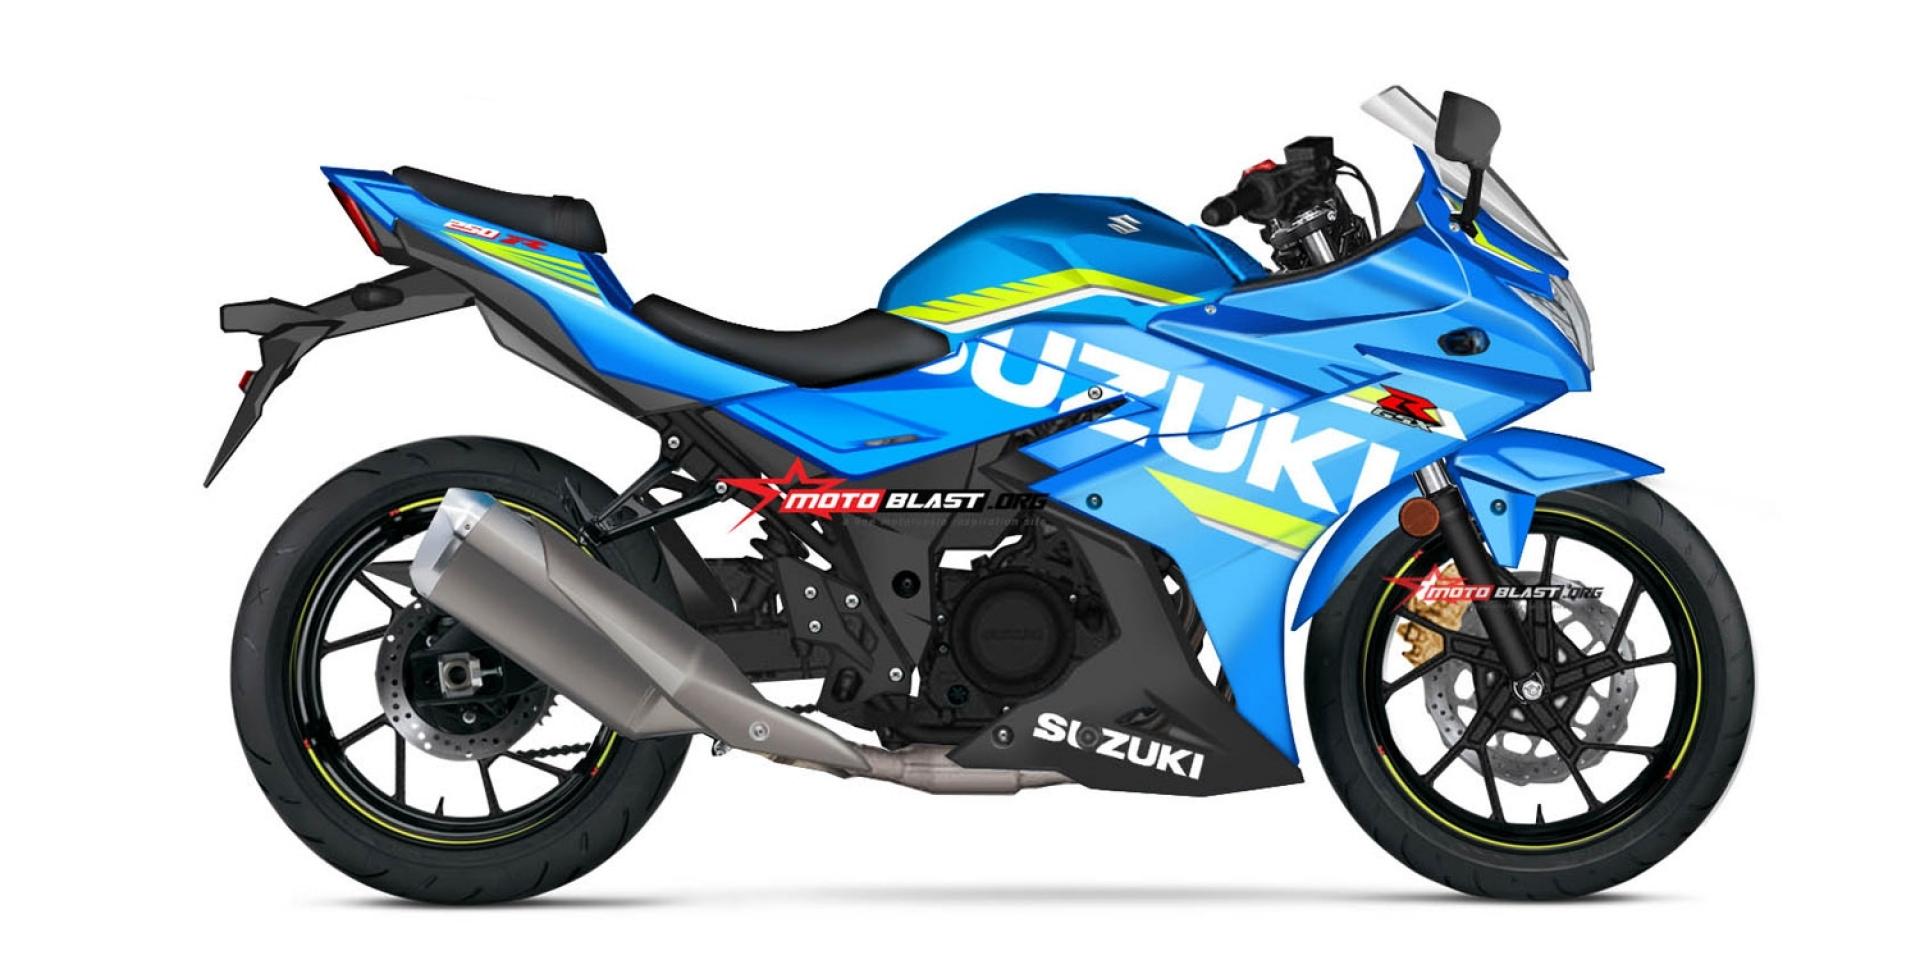 SUZUKI GSX-R250路測間諜照流出。將於科隆車展發表!